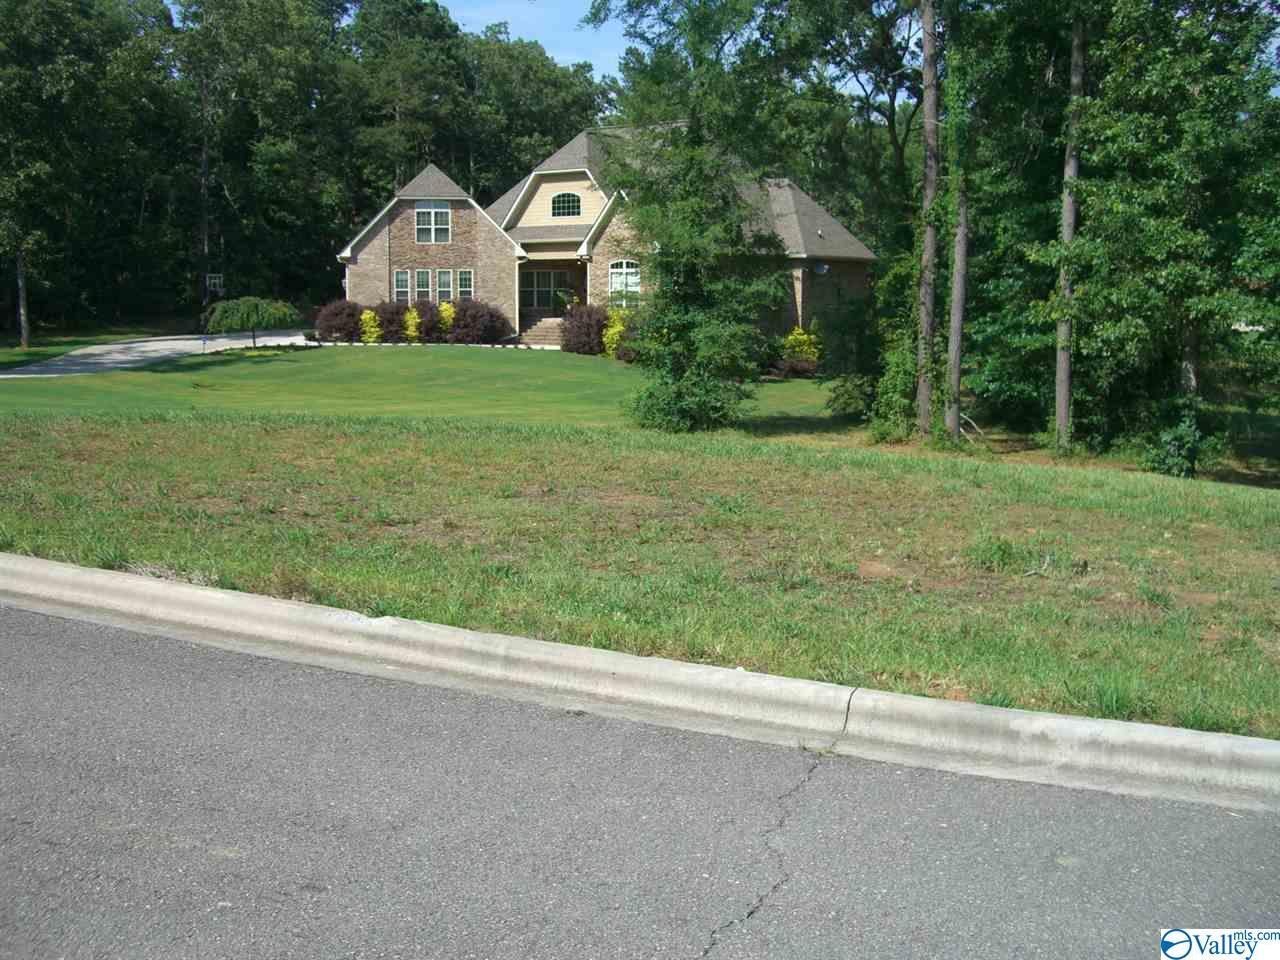 Lot 3 Wisteria Way, Scottsboro AL 35769